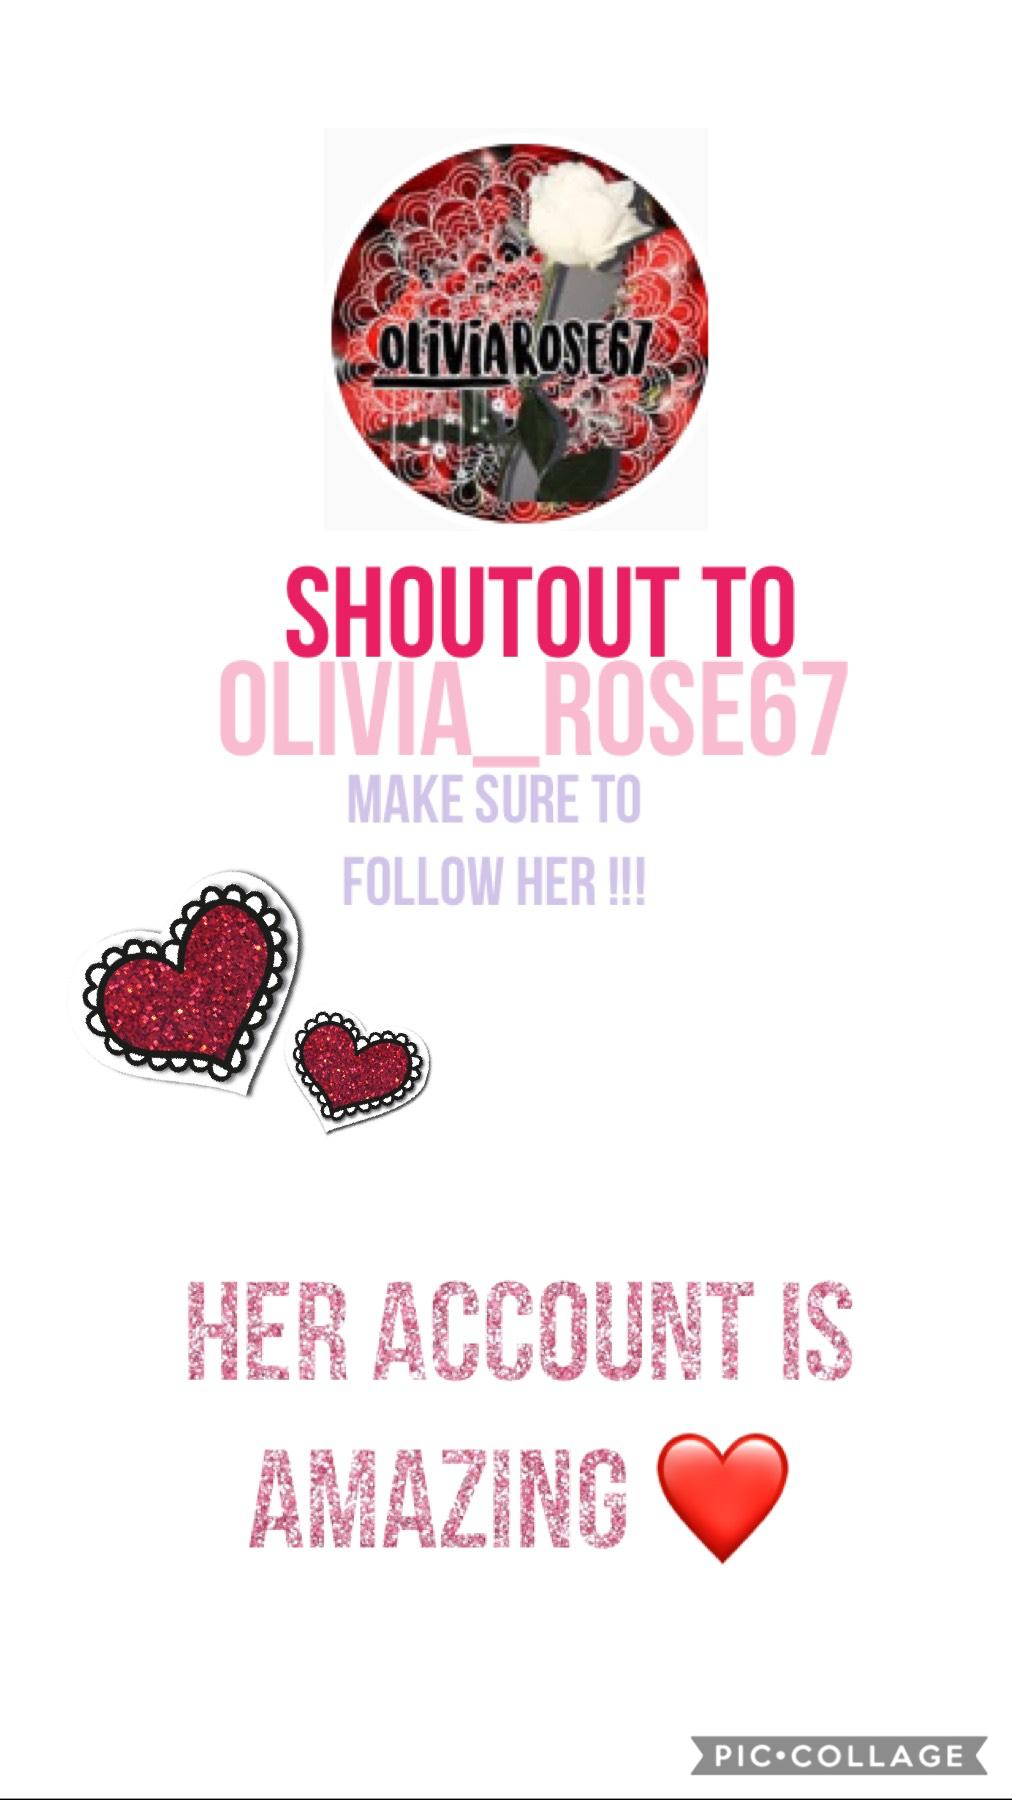 Follow her ❤️❤️❤️